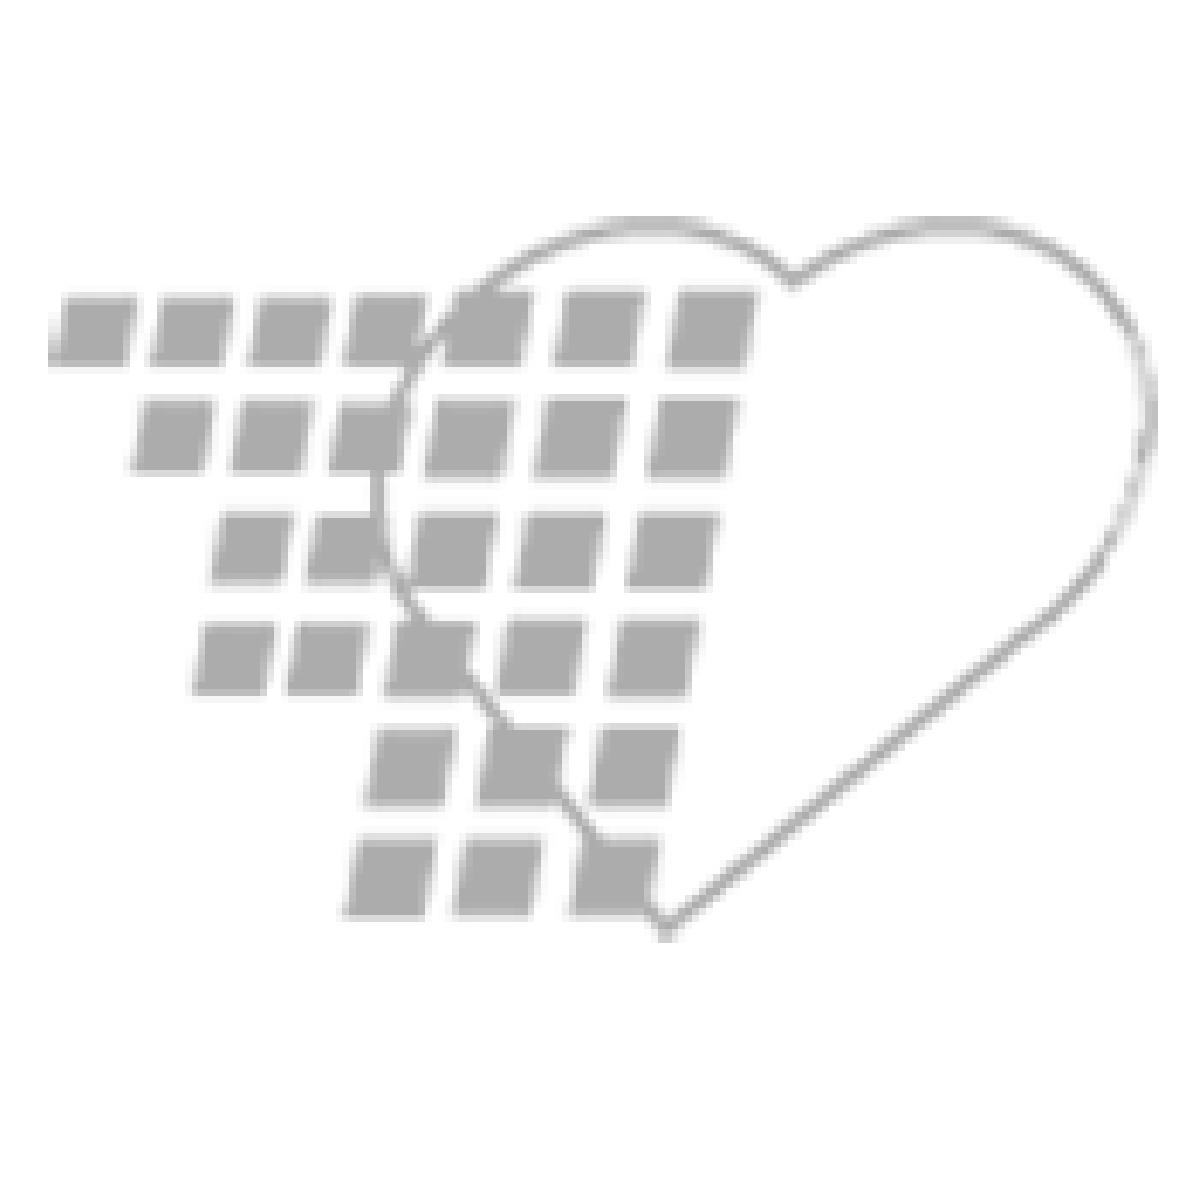 05-59-8300-3OZ - Bulb Syringe Sterile - 3oz